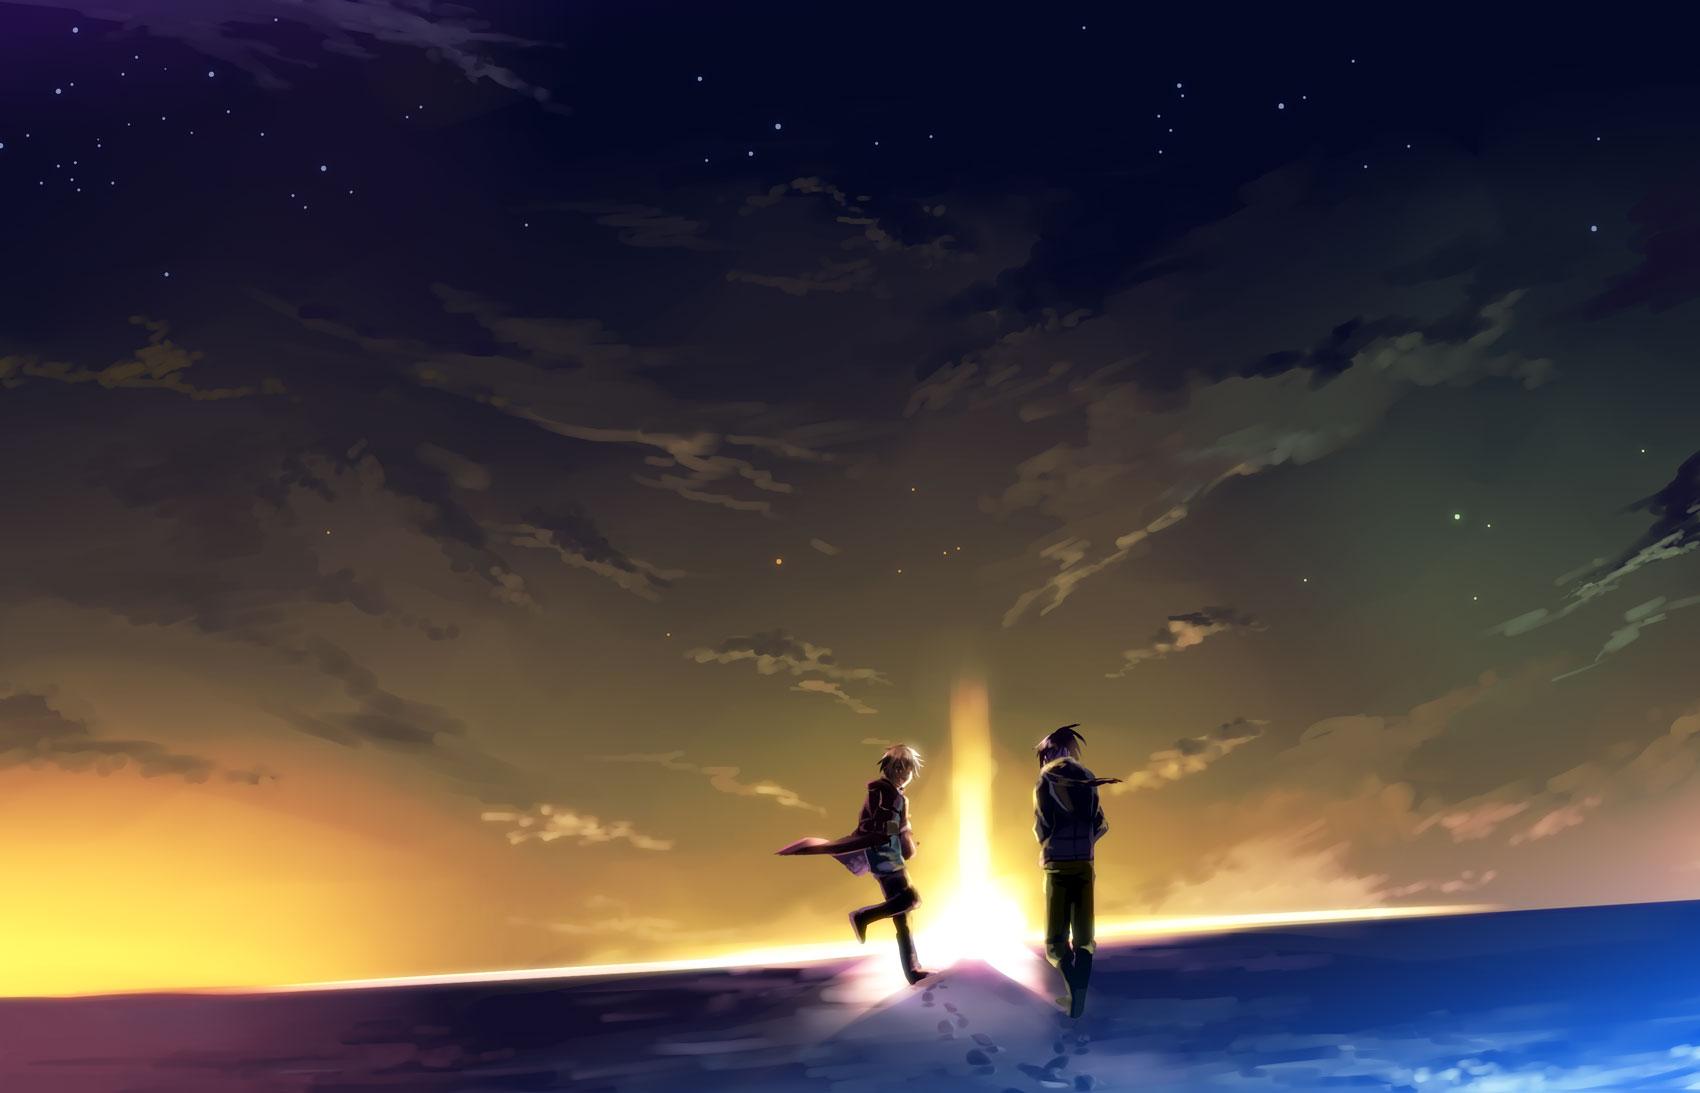 No6 Wallpaper 707679 Zerochan Anime Image Board